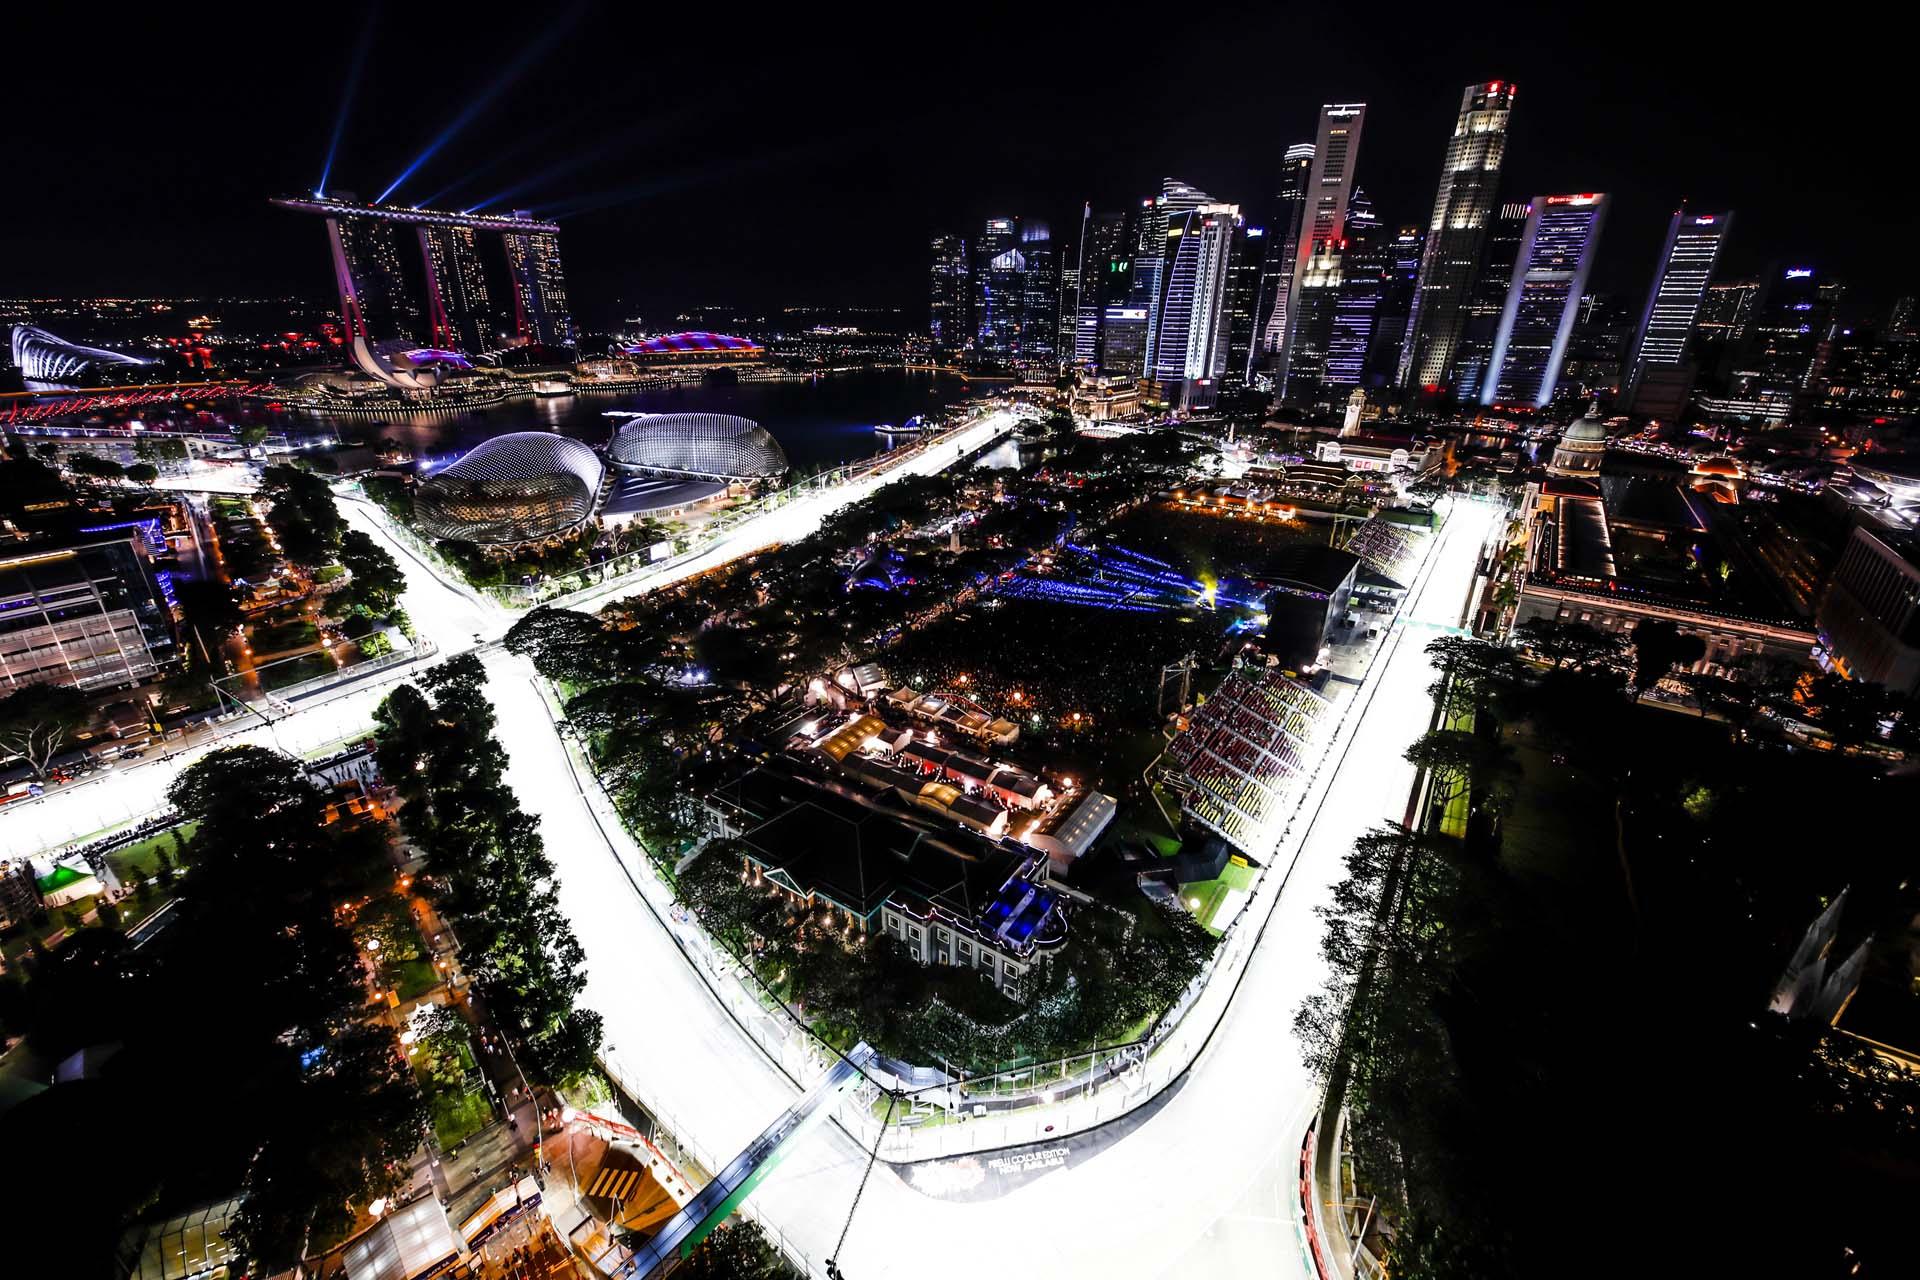 F1 - SINGAPORE GRAND PRIX 2017